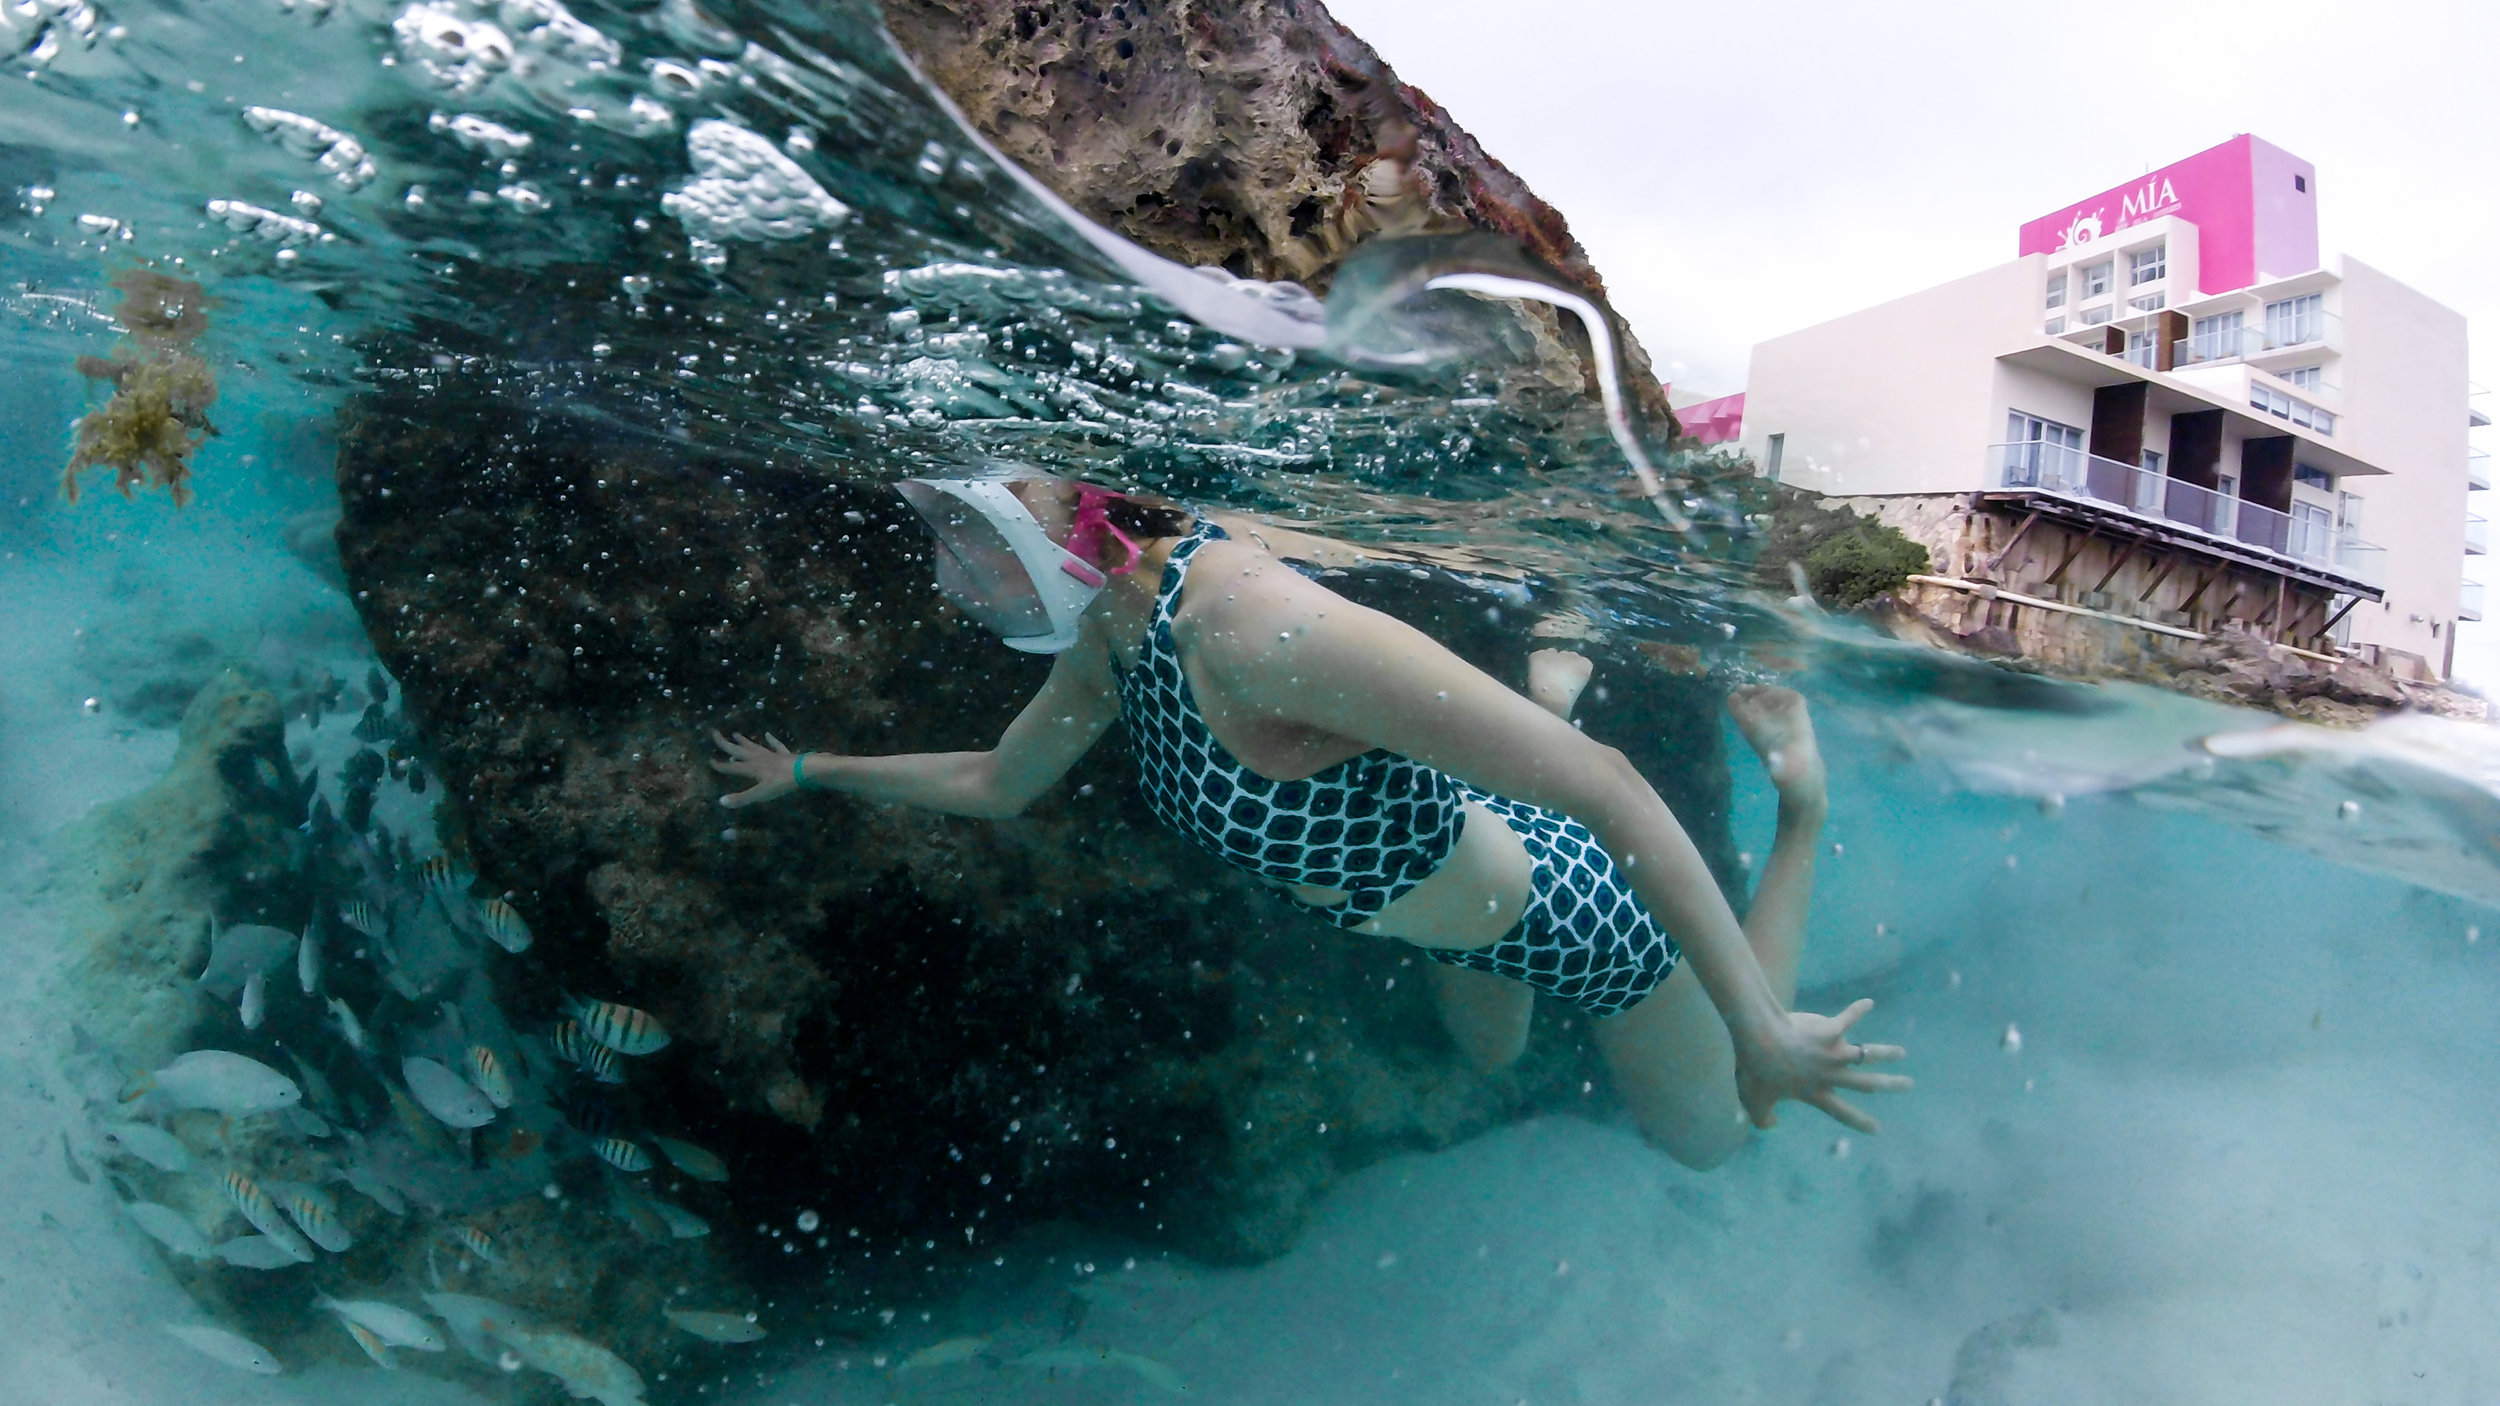 Charise snorkeling at Mia Reef.